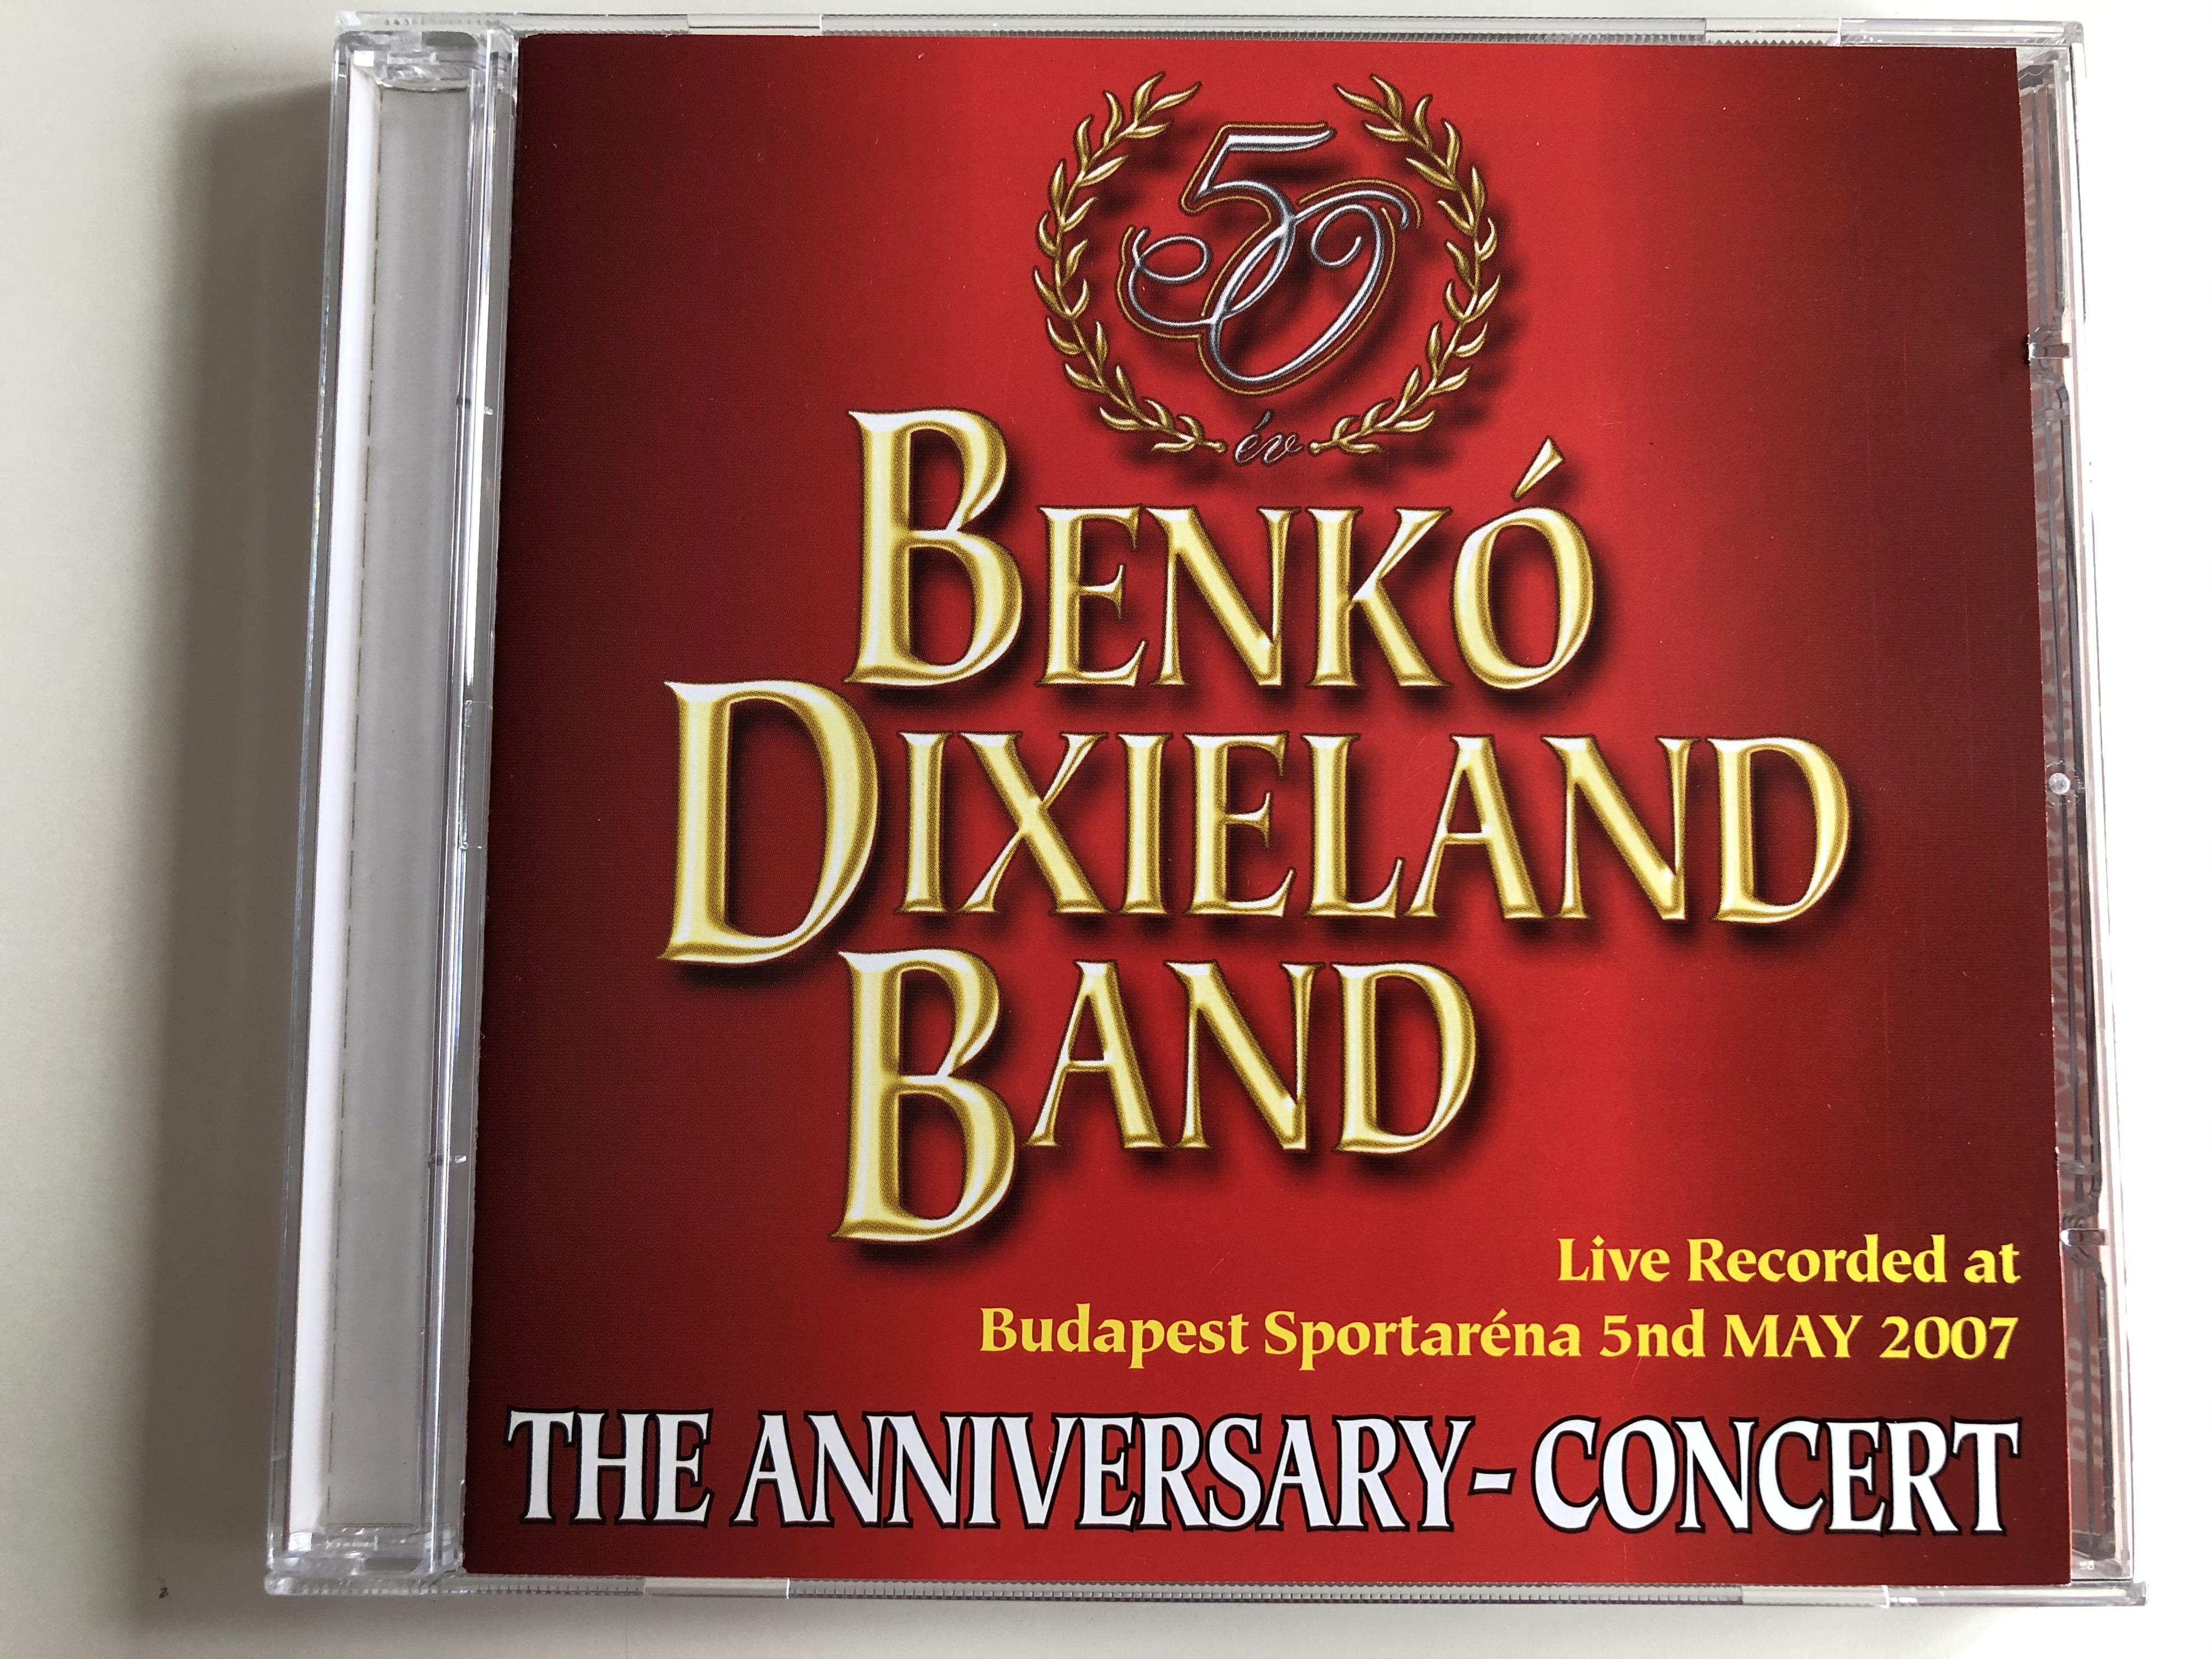 benk-dixieland-band-live-recorded-at-budapest-sportatrena-5nd-may-2007-the-anisversary-concert-bencolor-kft.-audio-cd-2007-stereo-ben-cd-5451-1-.jpg